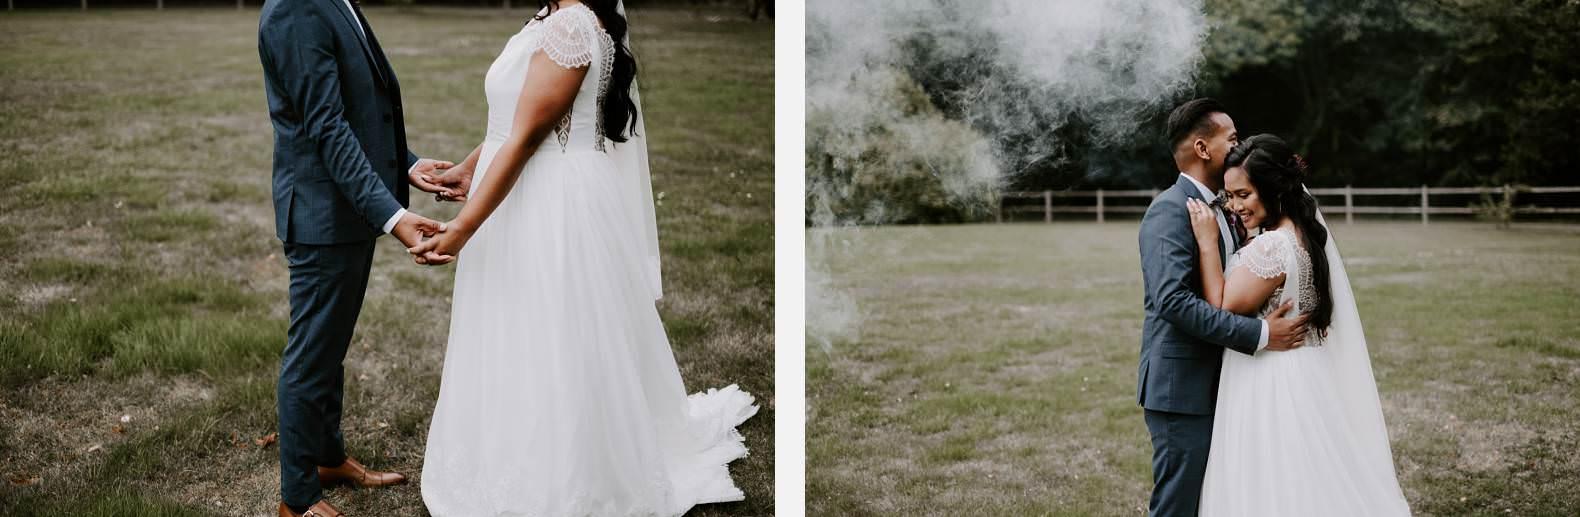 mariage manoir de corny photographe bel esprit 0059